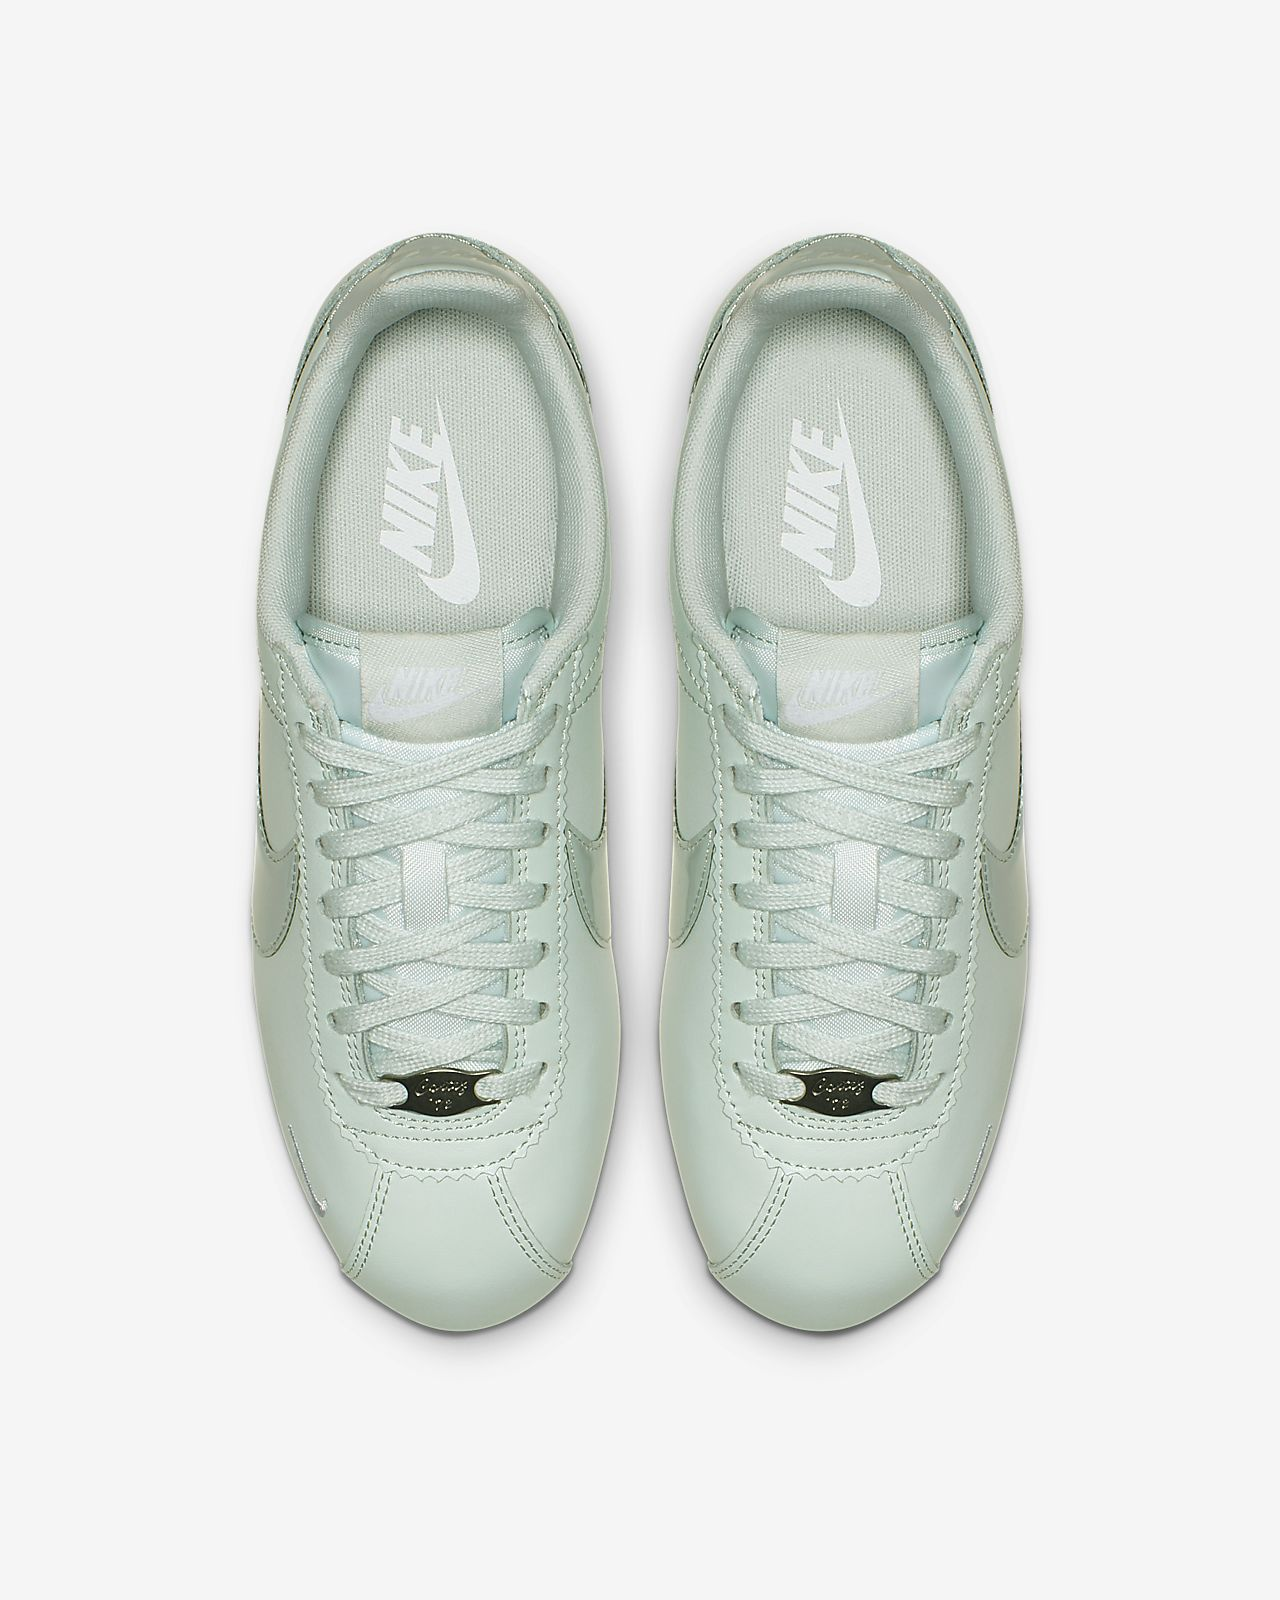 081135b5fb21 Buty damskie Nike Classic Cortez Premium. Nike.com PL